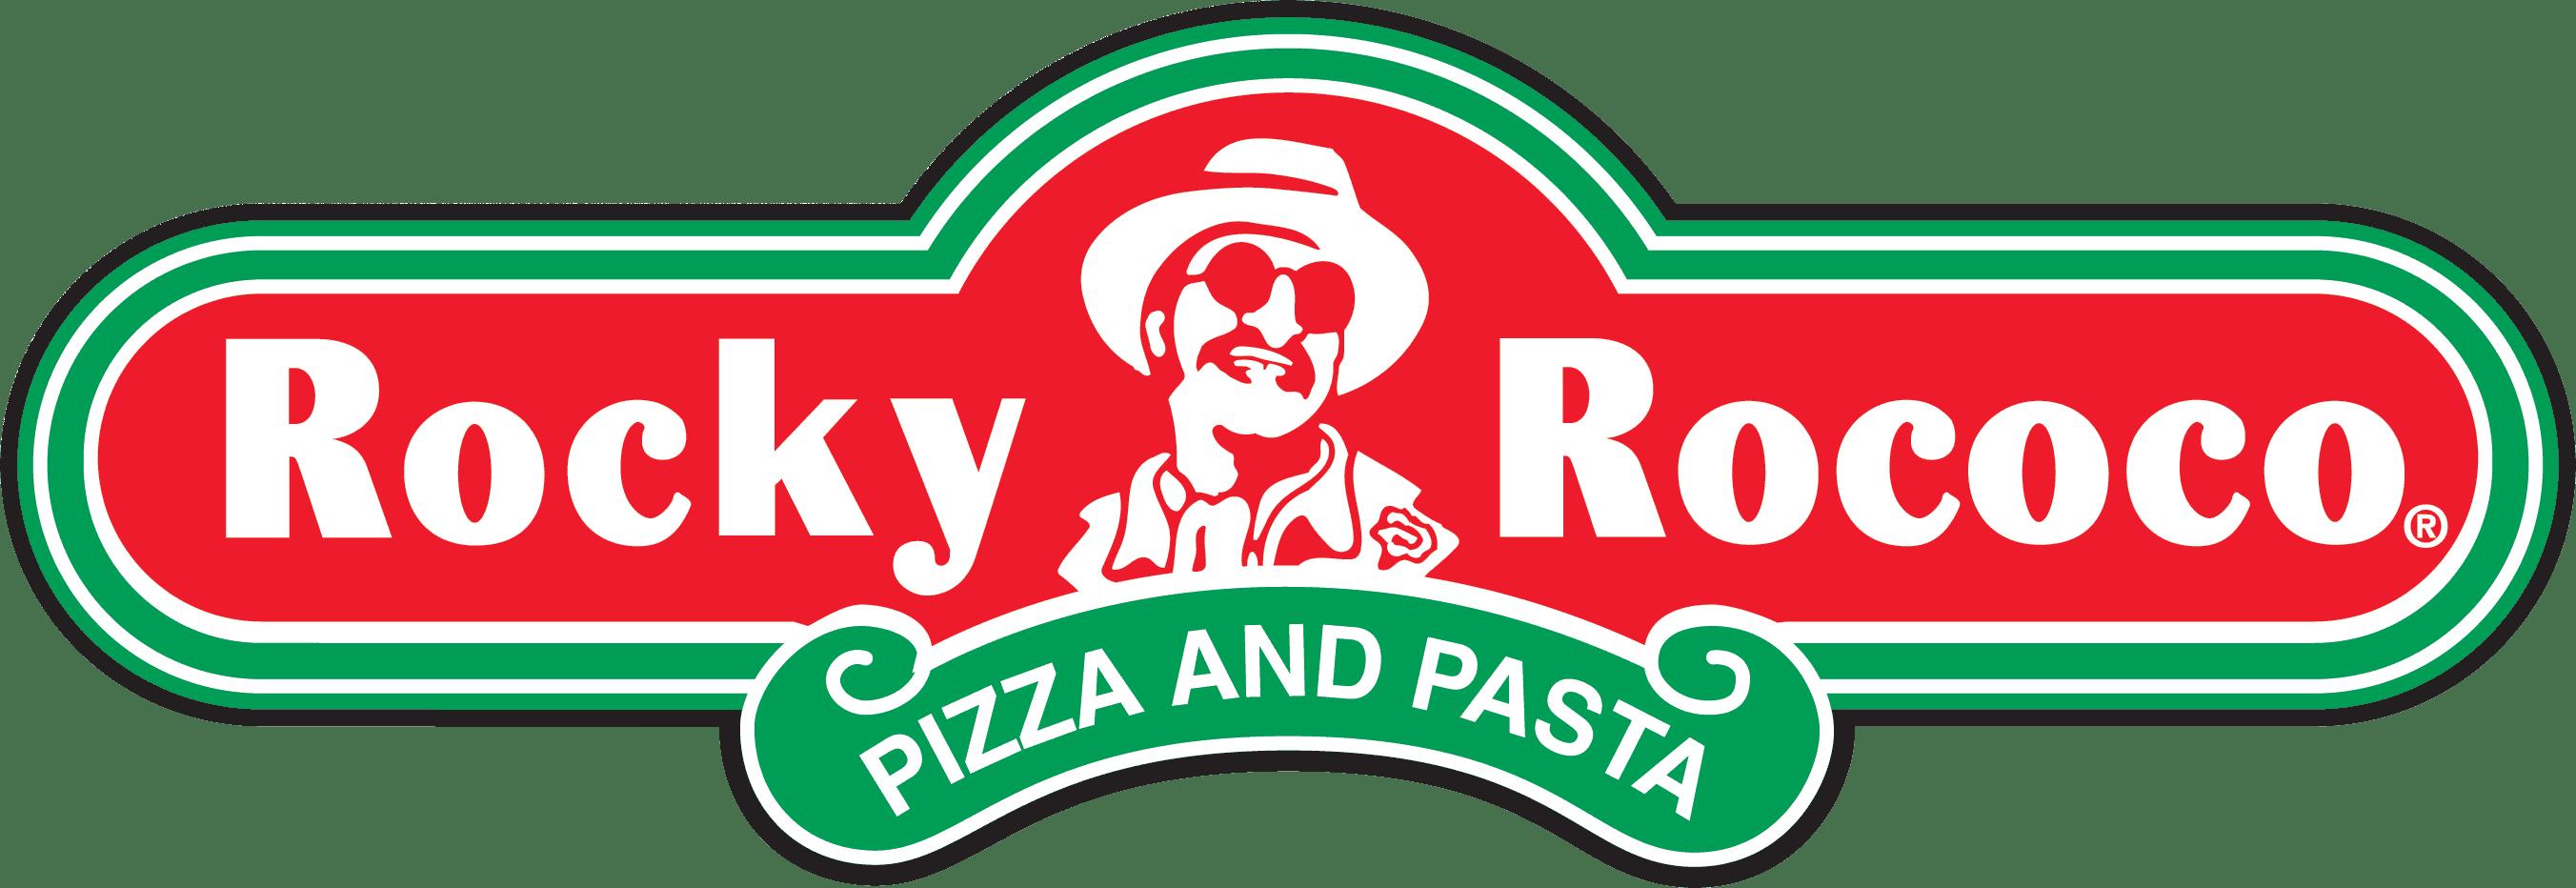 Rocky Rococo - Sheboygan Logo